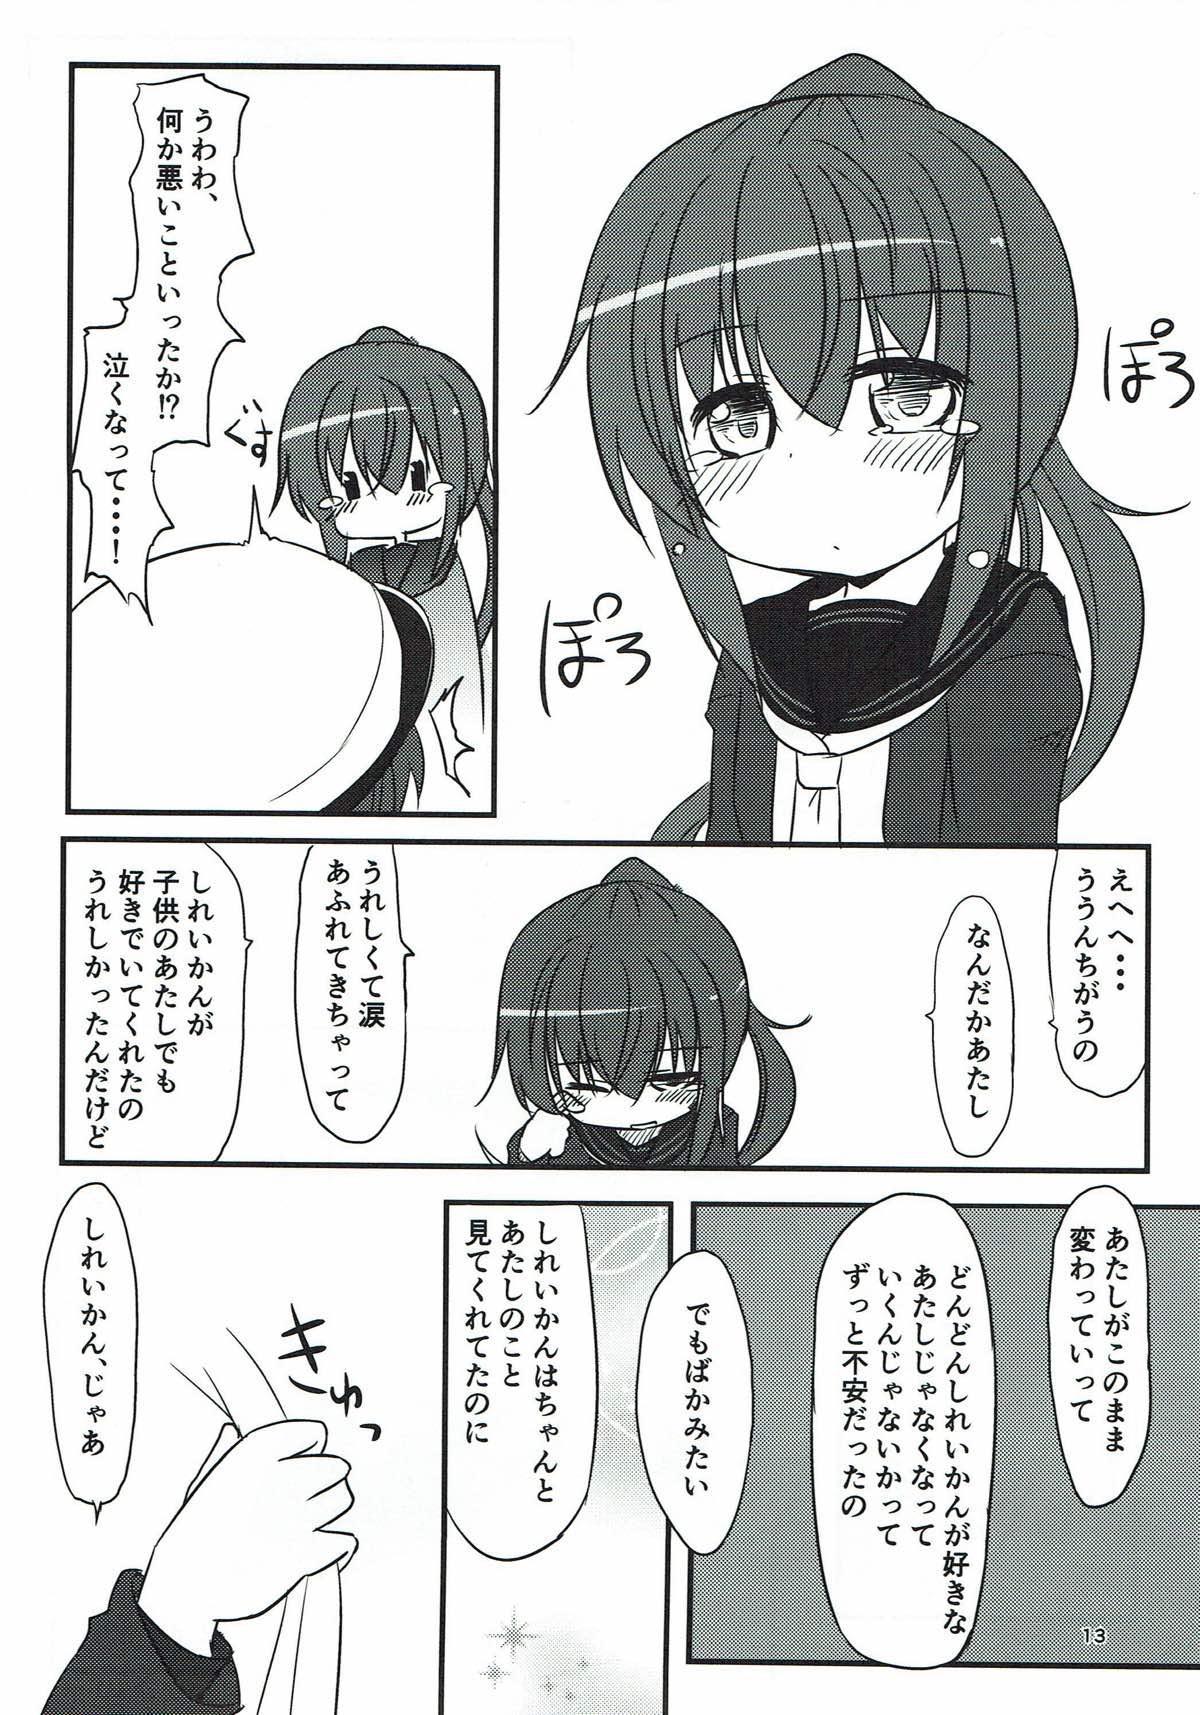 Fumizuki datte Chanto Dekirun dakara! 11